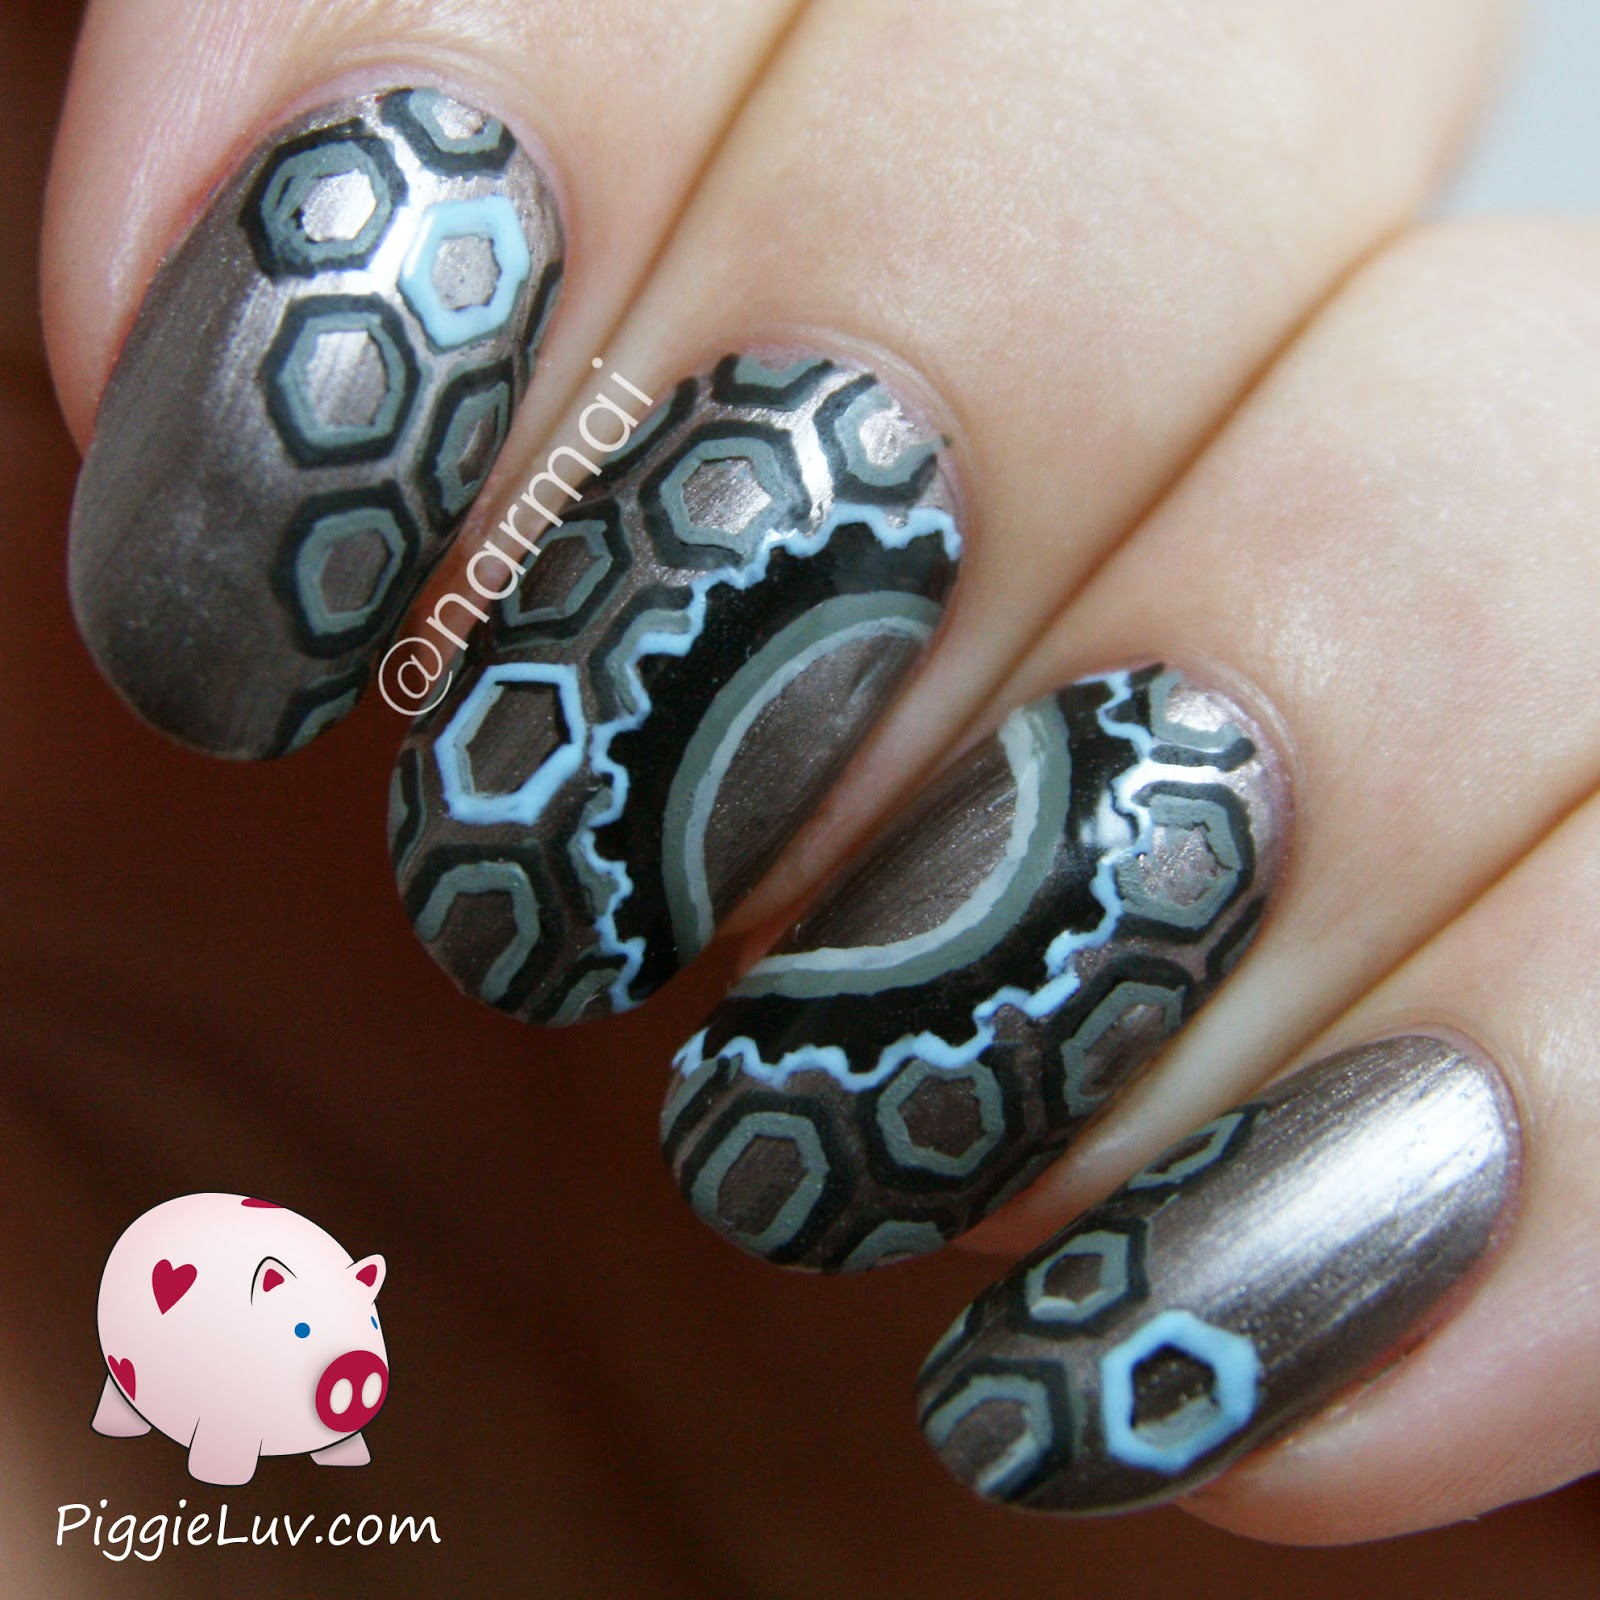 PiggieLuv: Technologic wheels & cogs nail art